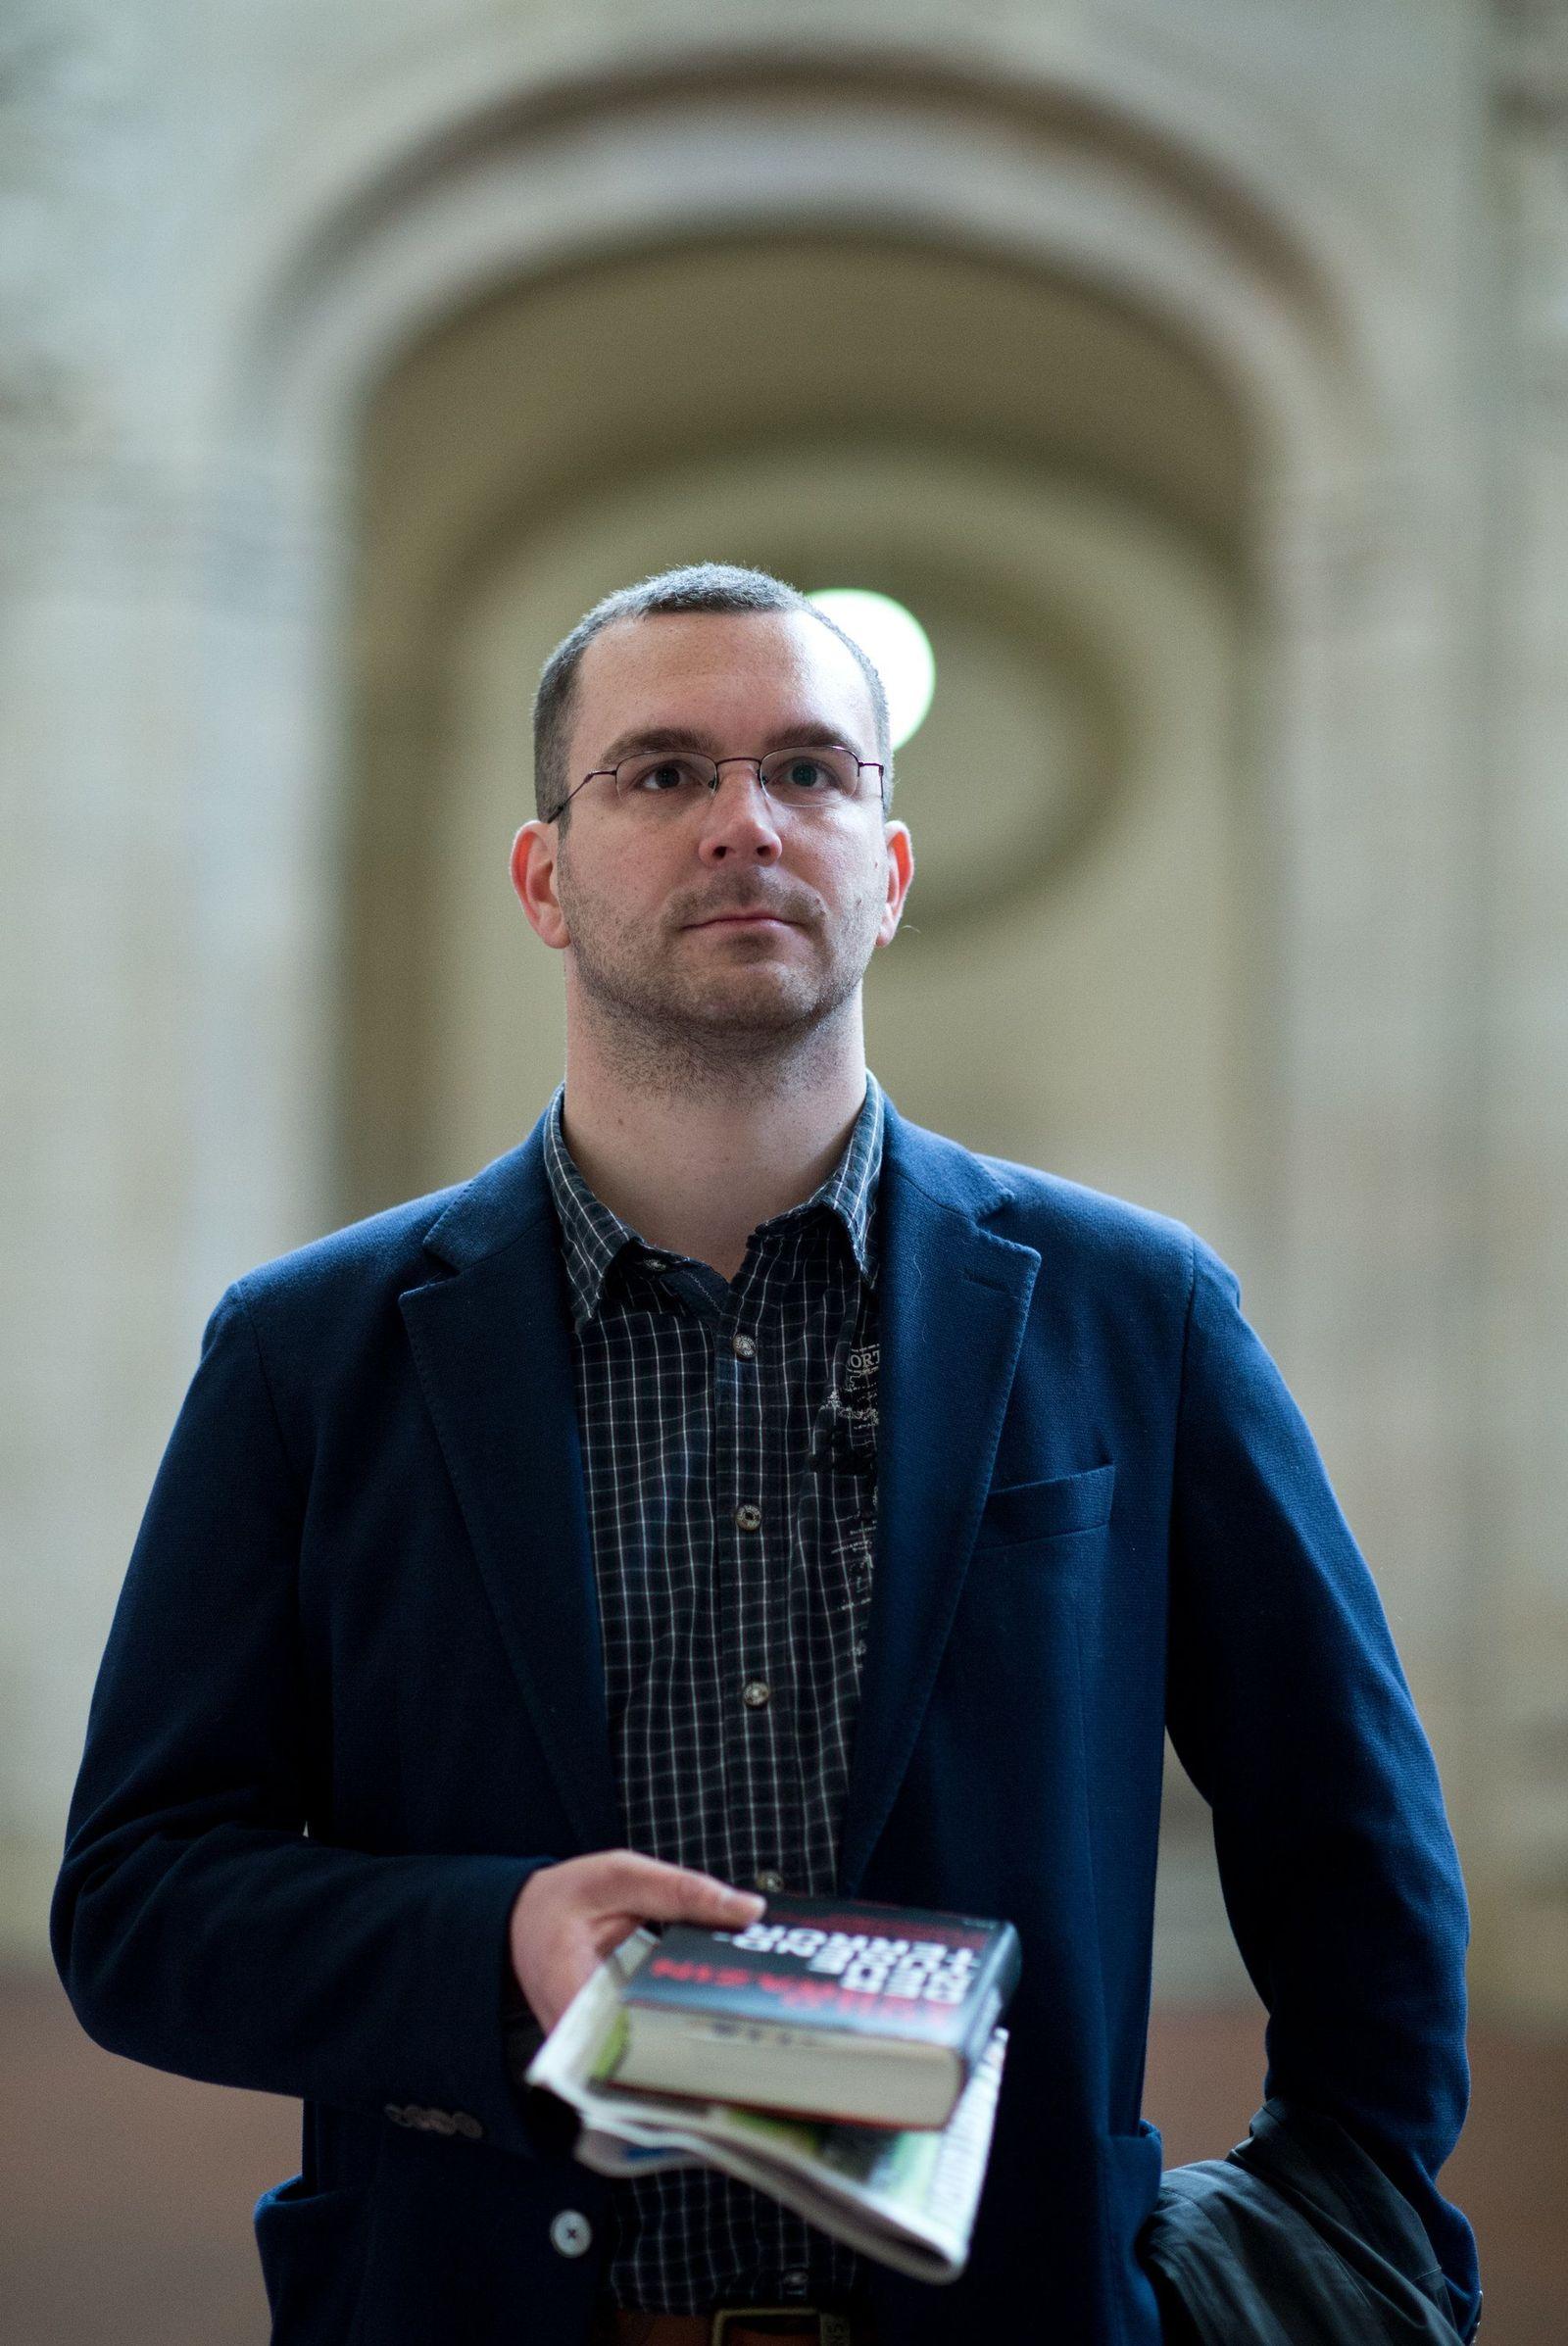 Prozess gegen NPD-Landeschef Schmidtke